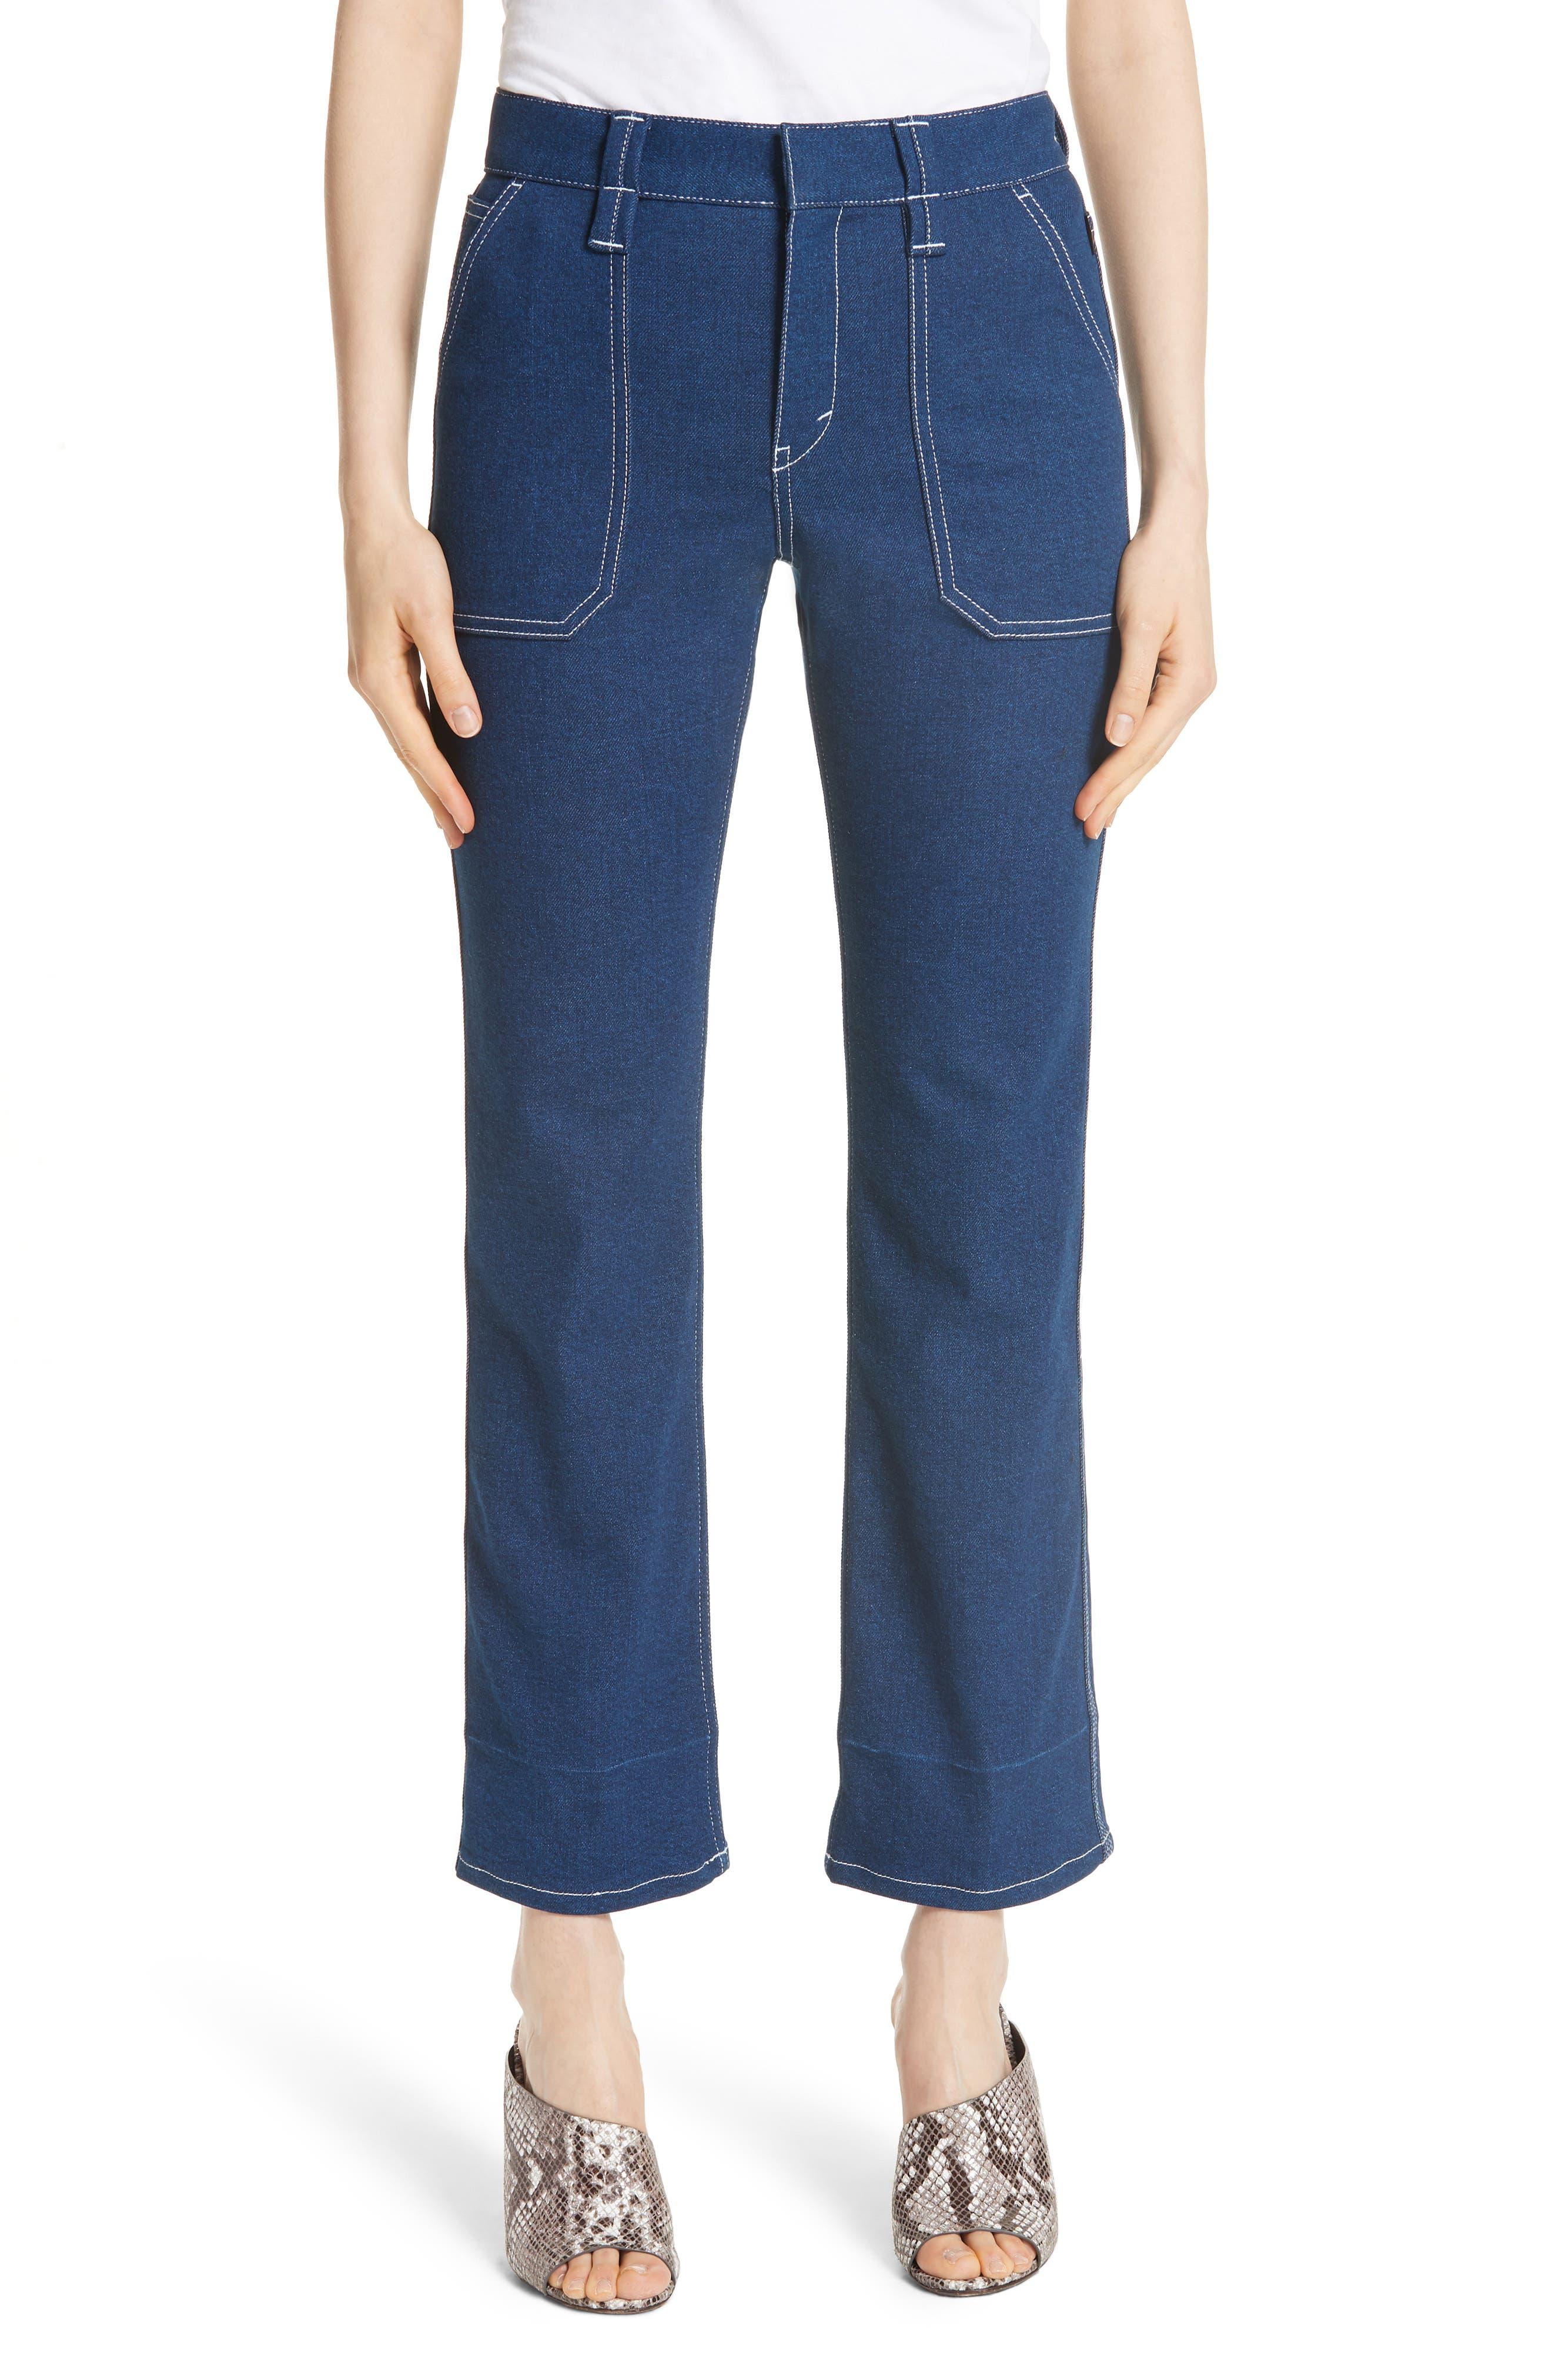 Chloé Contrast Circle Stitch Jeans (Ultramarine)